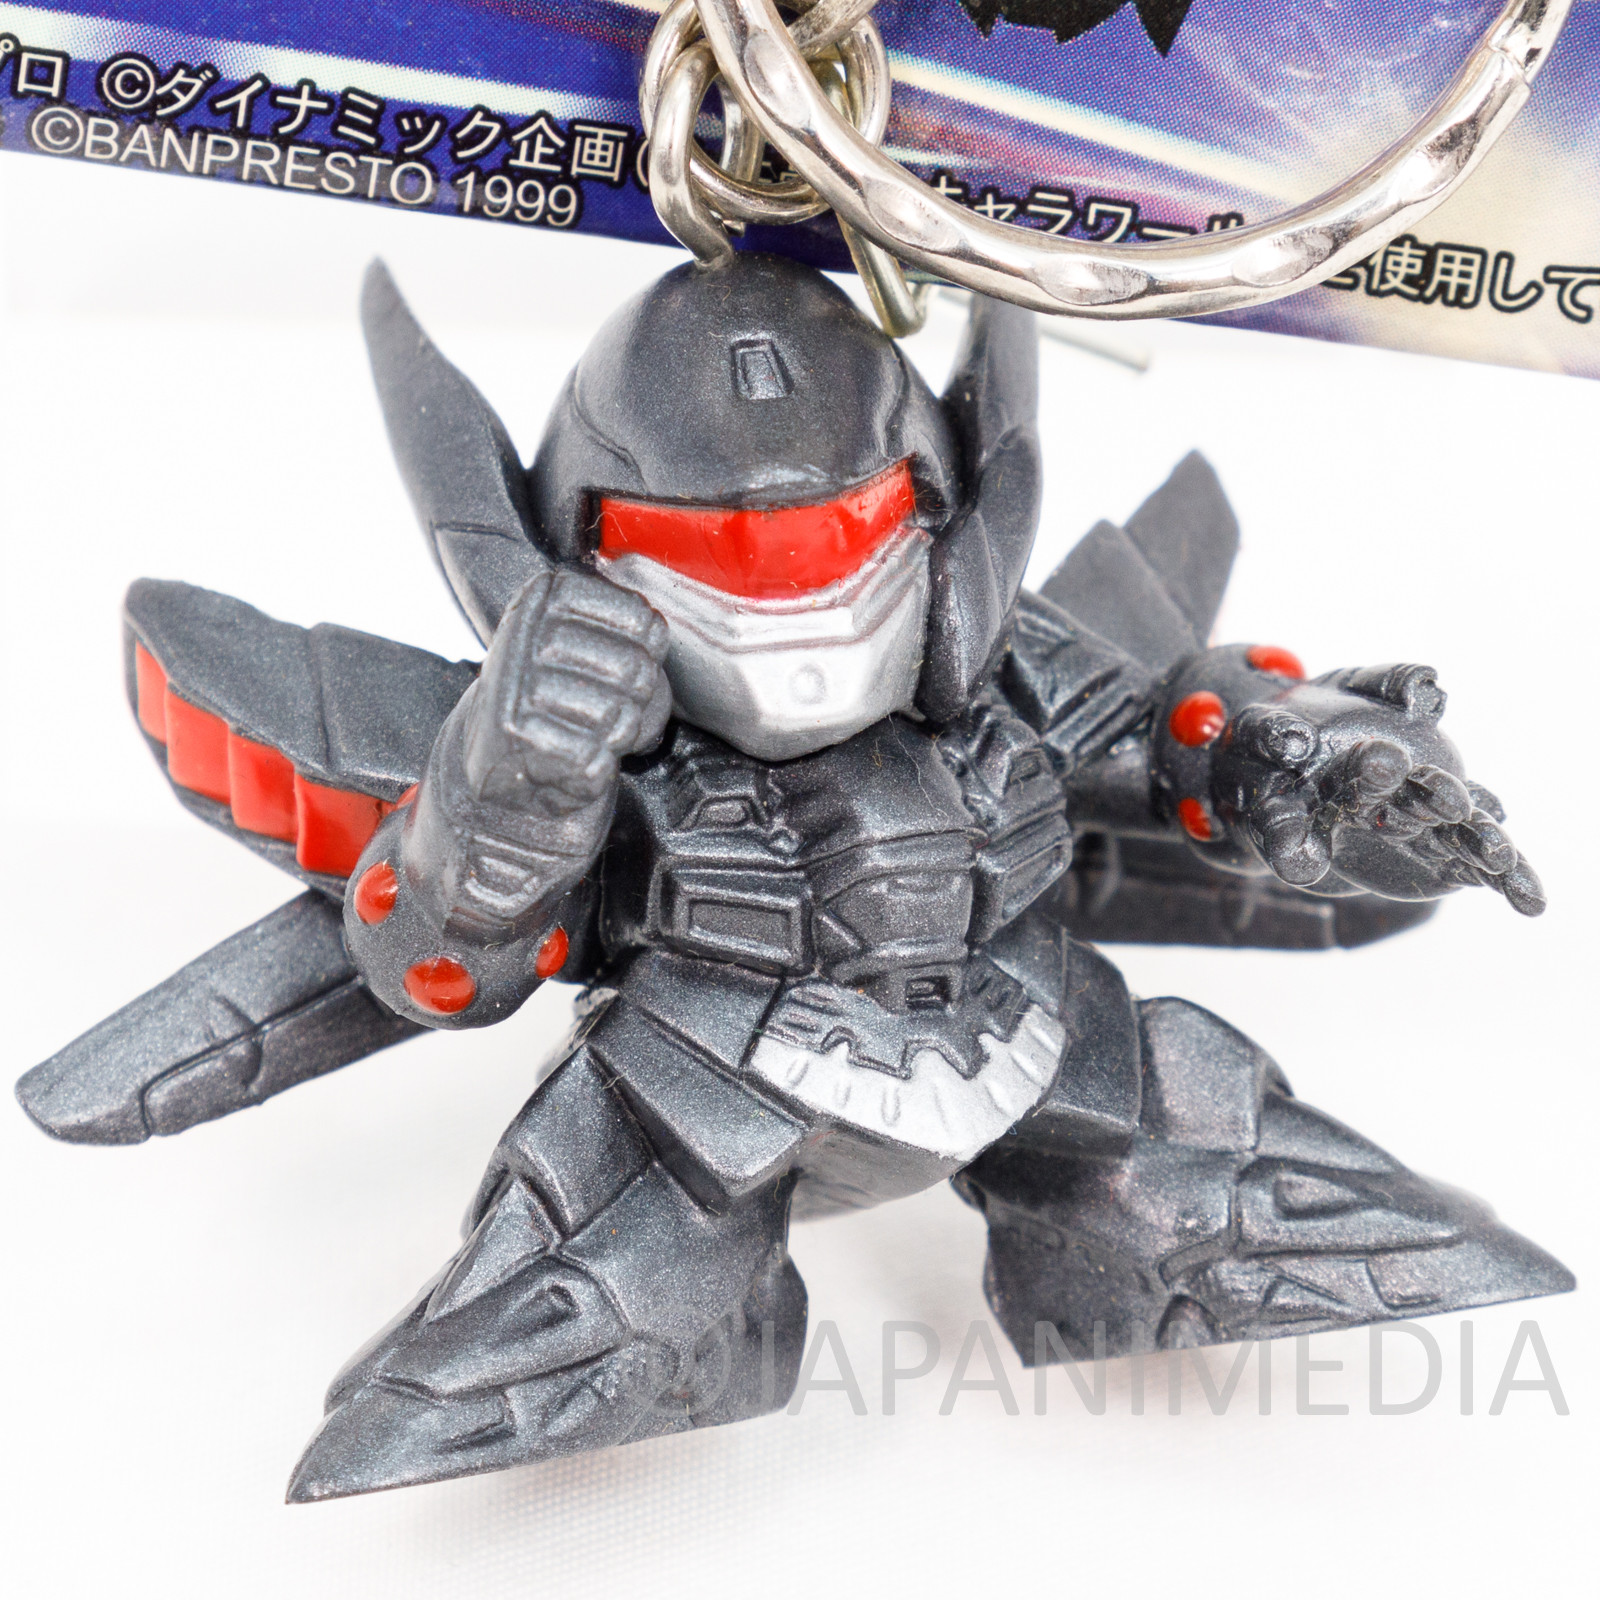 Gespenst Super Robot Wars Figure Key Chain JAPAN ANIME MANGA